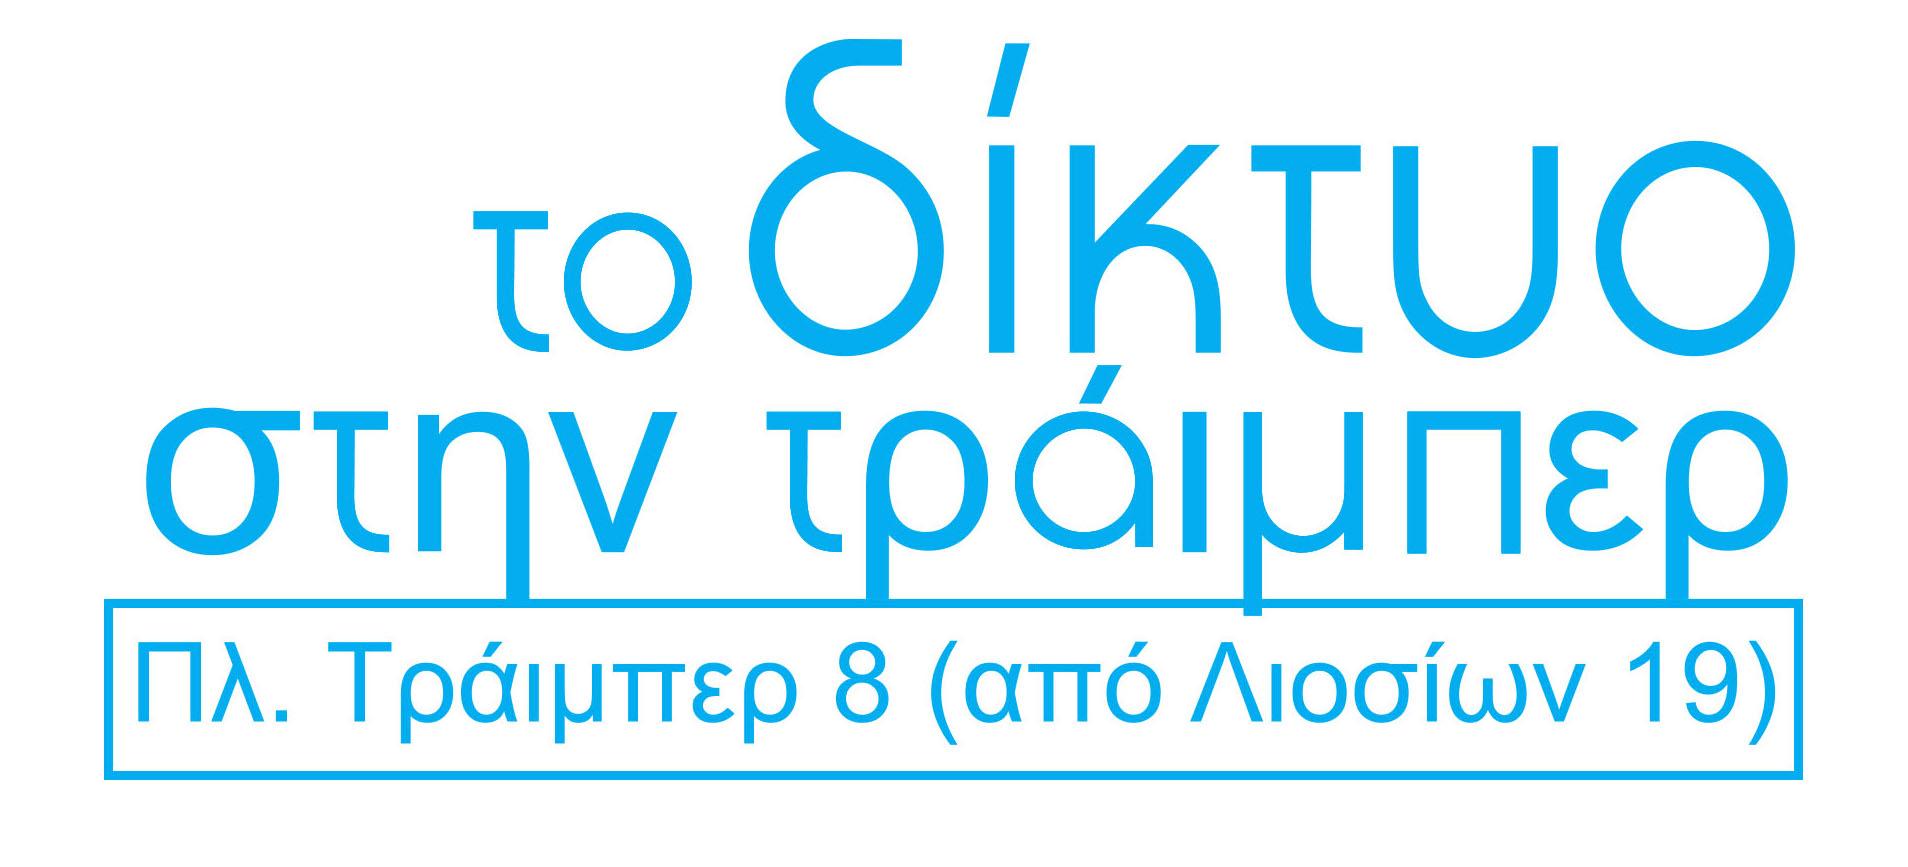 diktyo_logos_02 copy 2